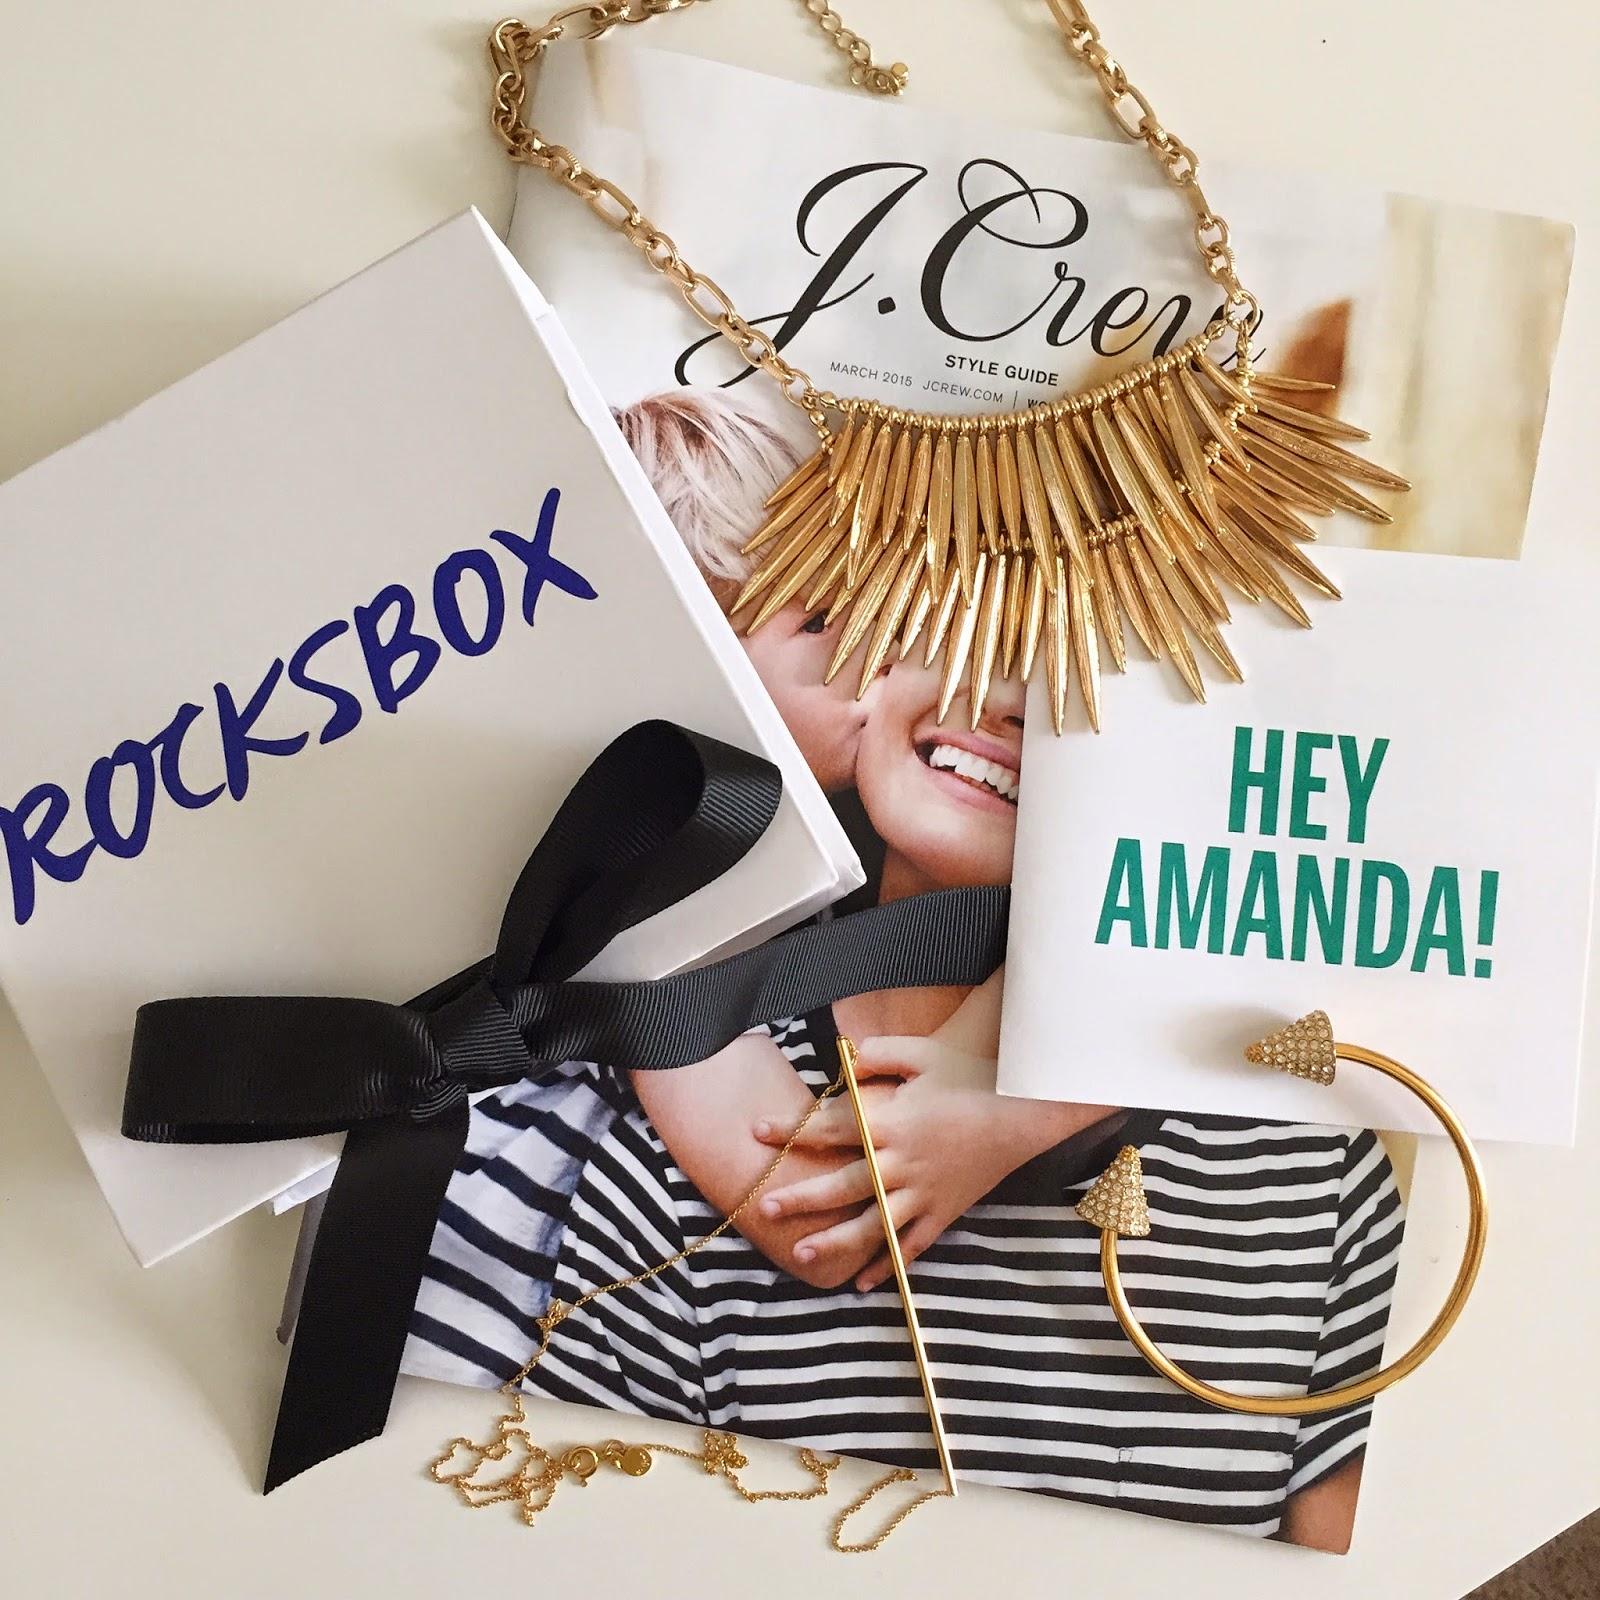 free rocksbox code, rocksbox promo code, rocks box review